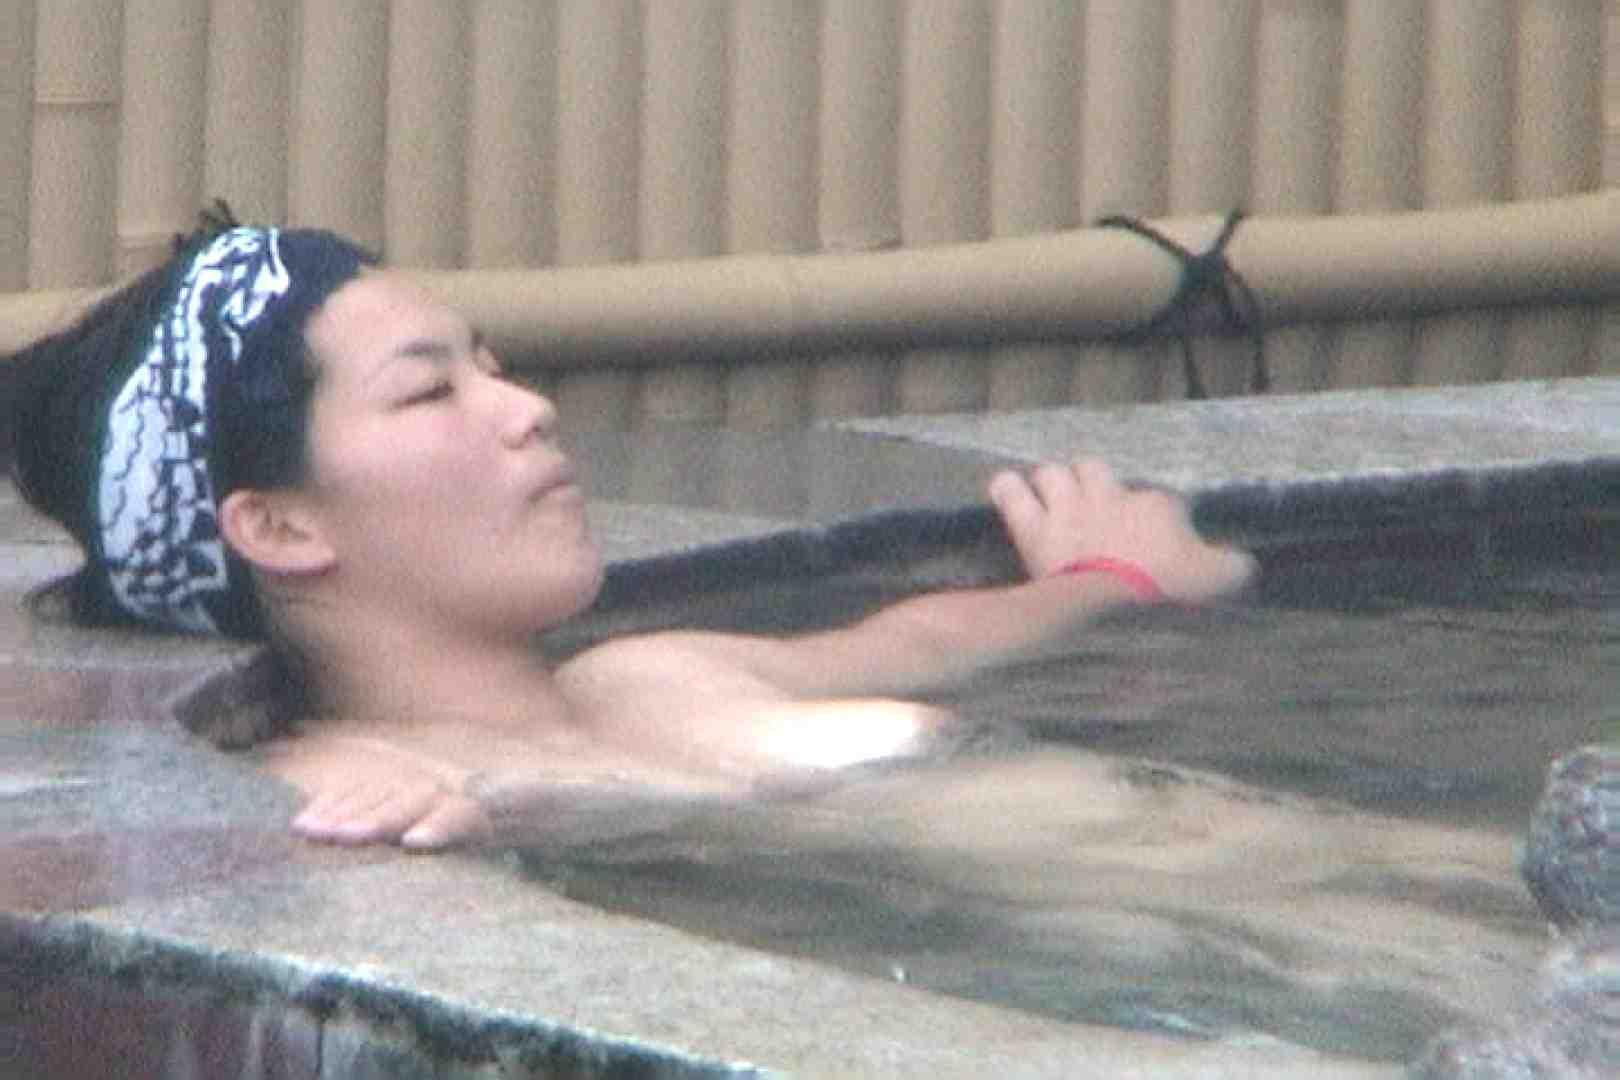 Aquaな露天風呂Vol.103 OLセックス 隠し撮りAV無料 57画像 17